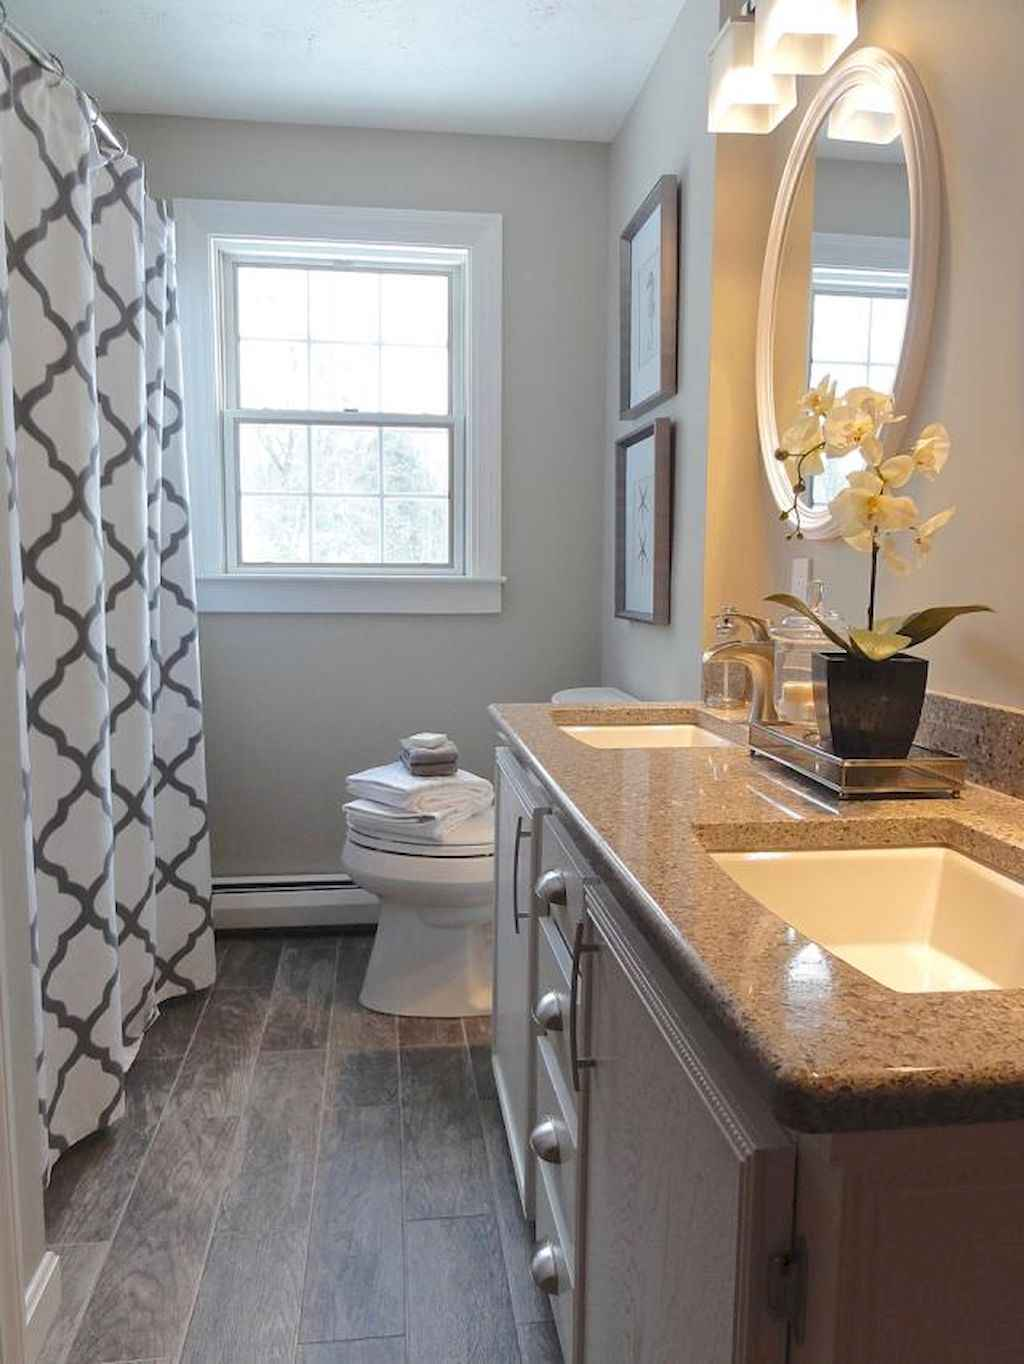 Inspiring apartment bathroom remodel ideas on a budget (5)